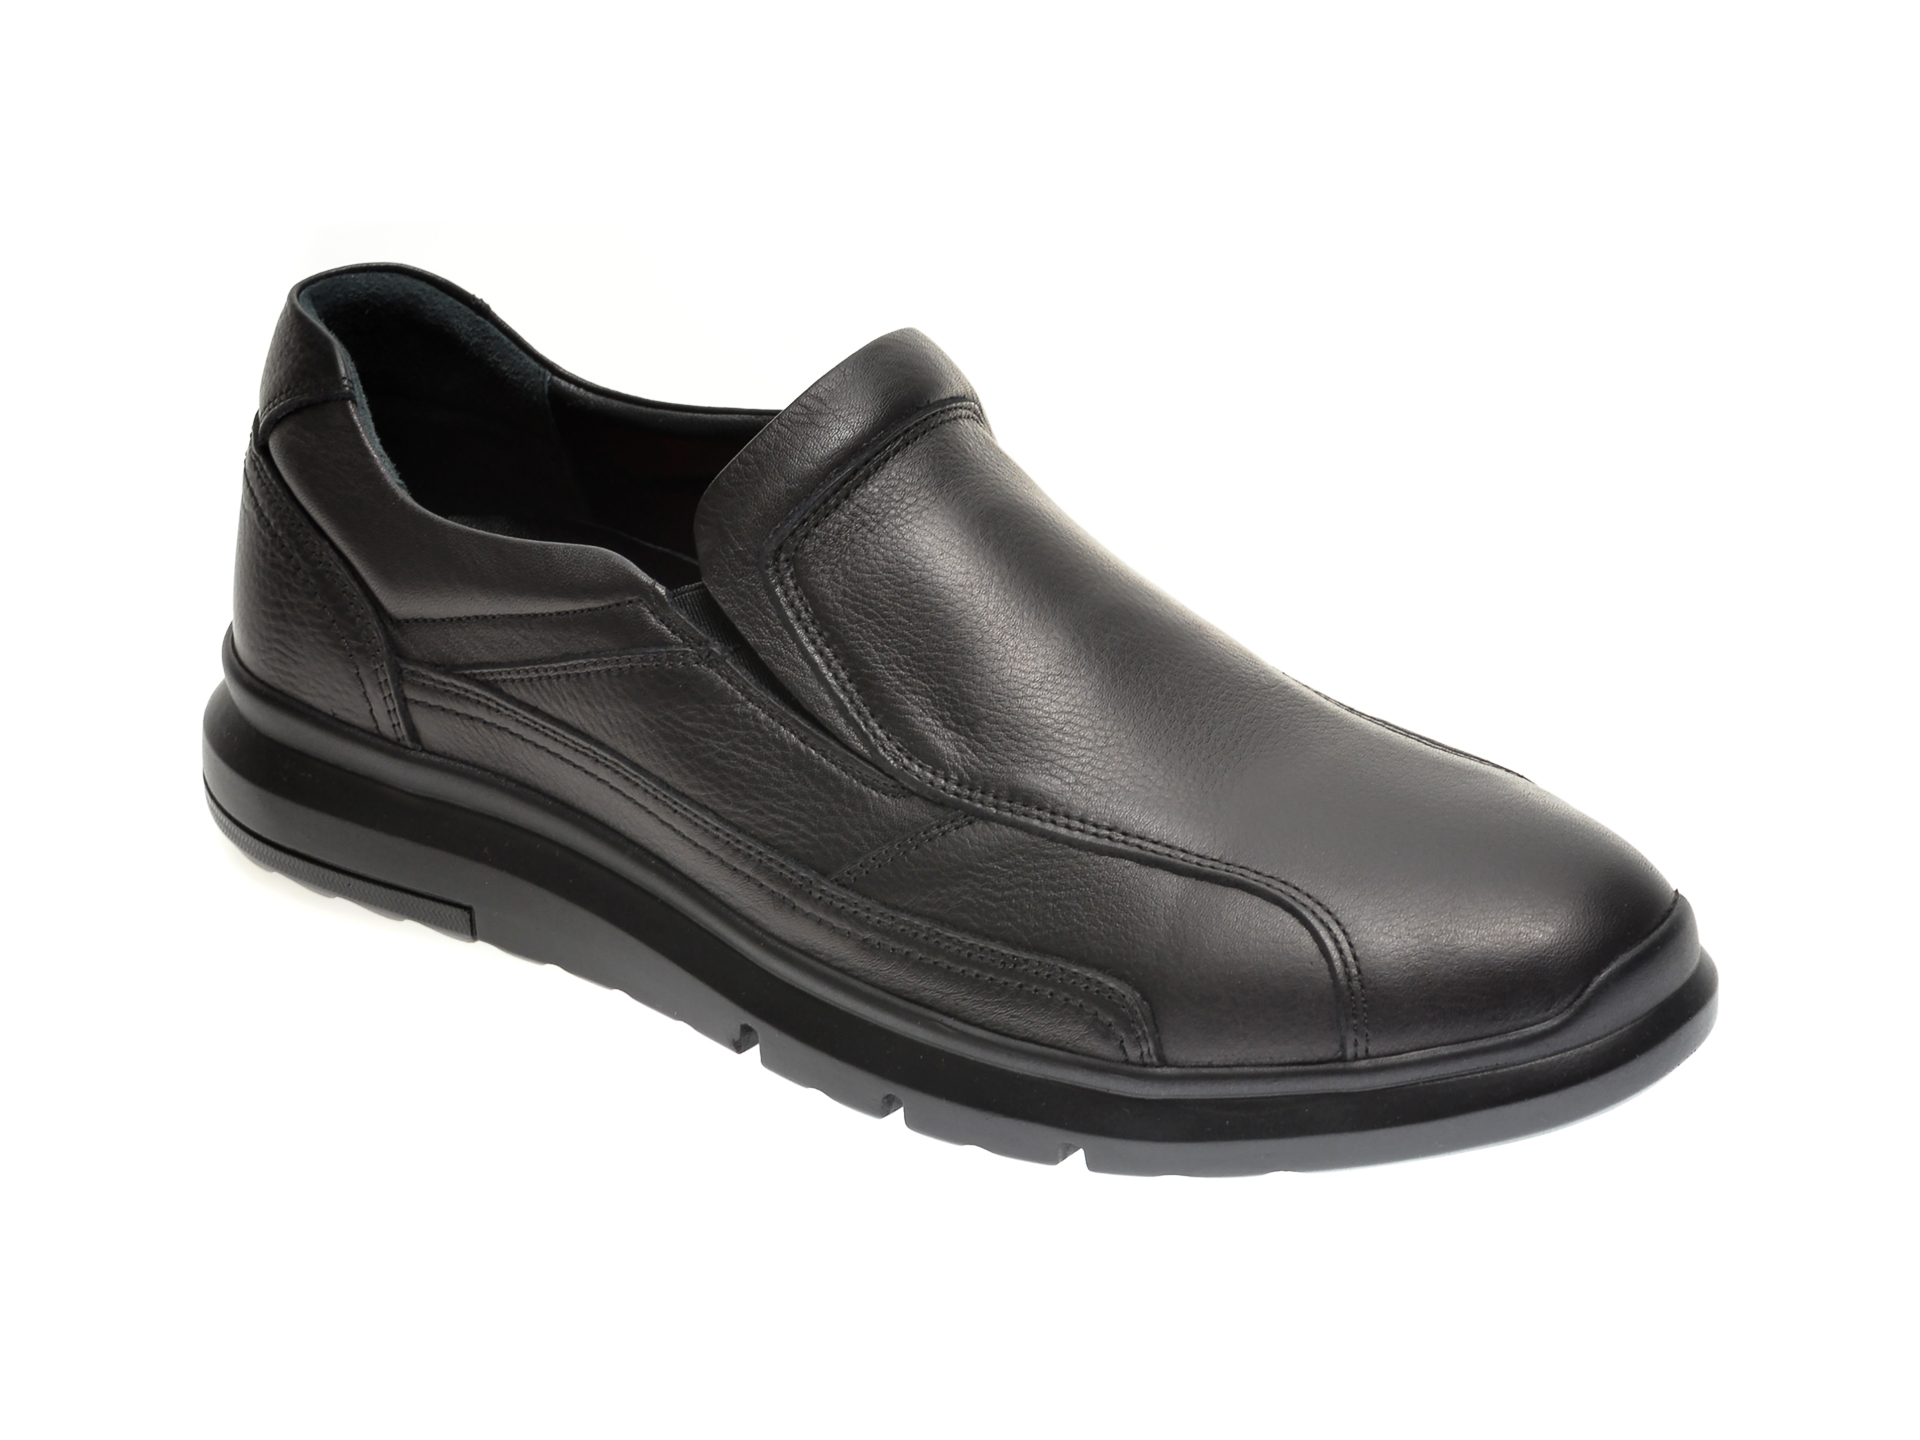 Pantofi Otter Negri, Ttp41, Din Piele Naturala